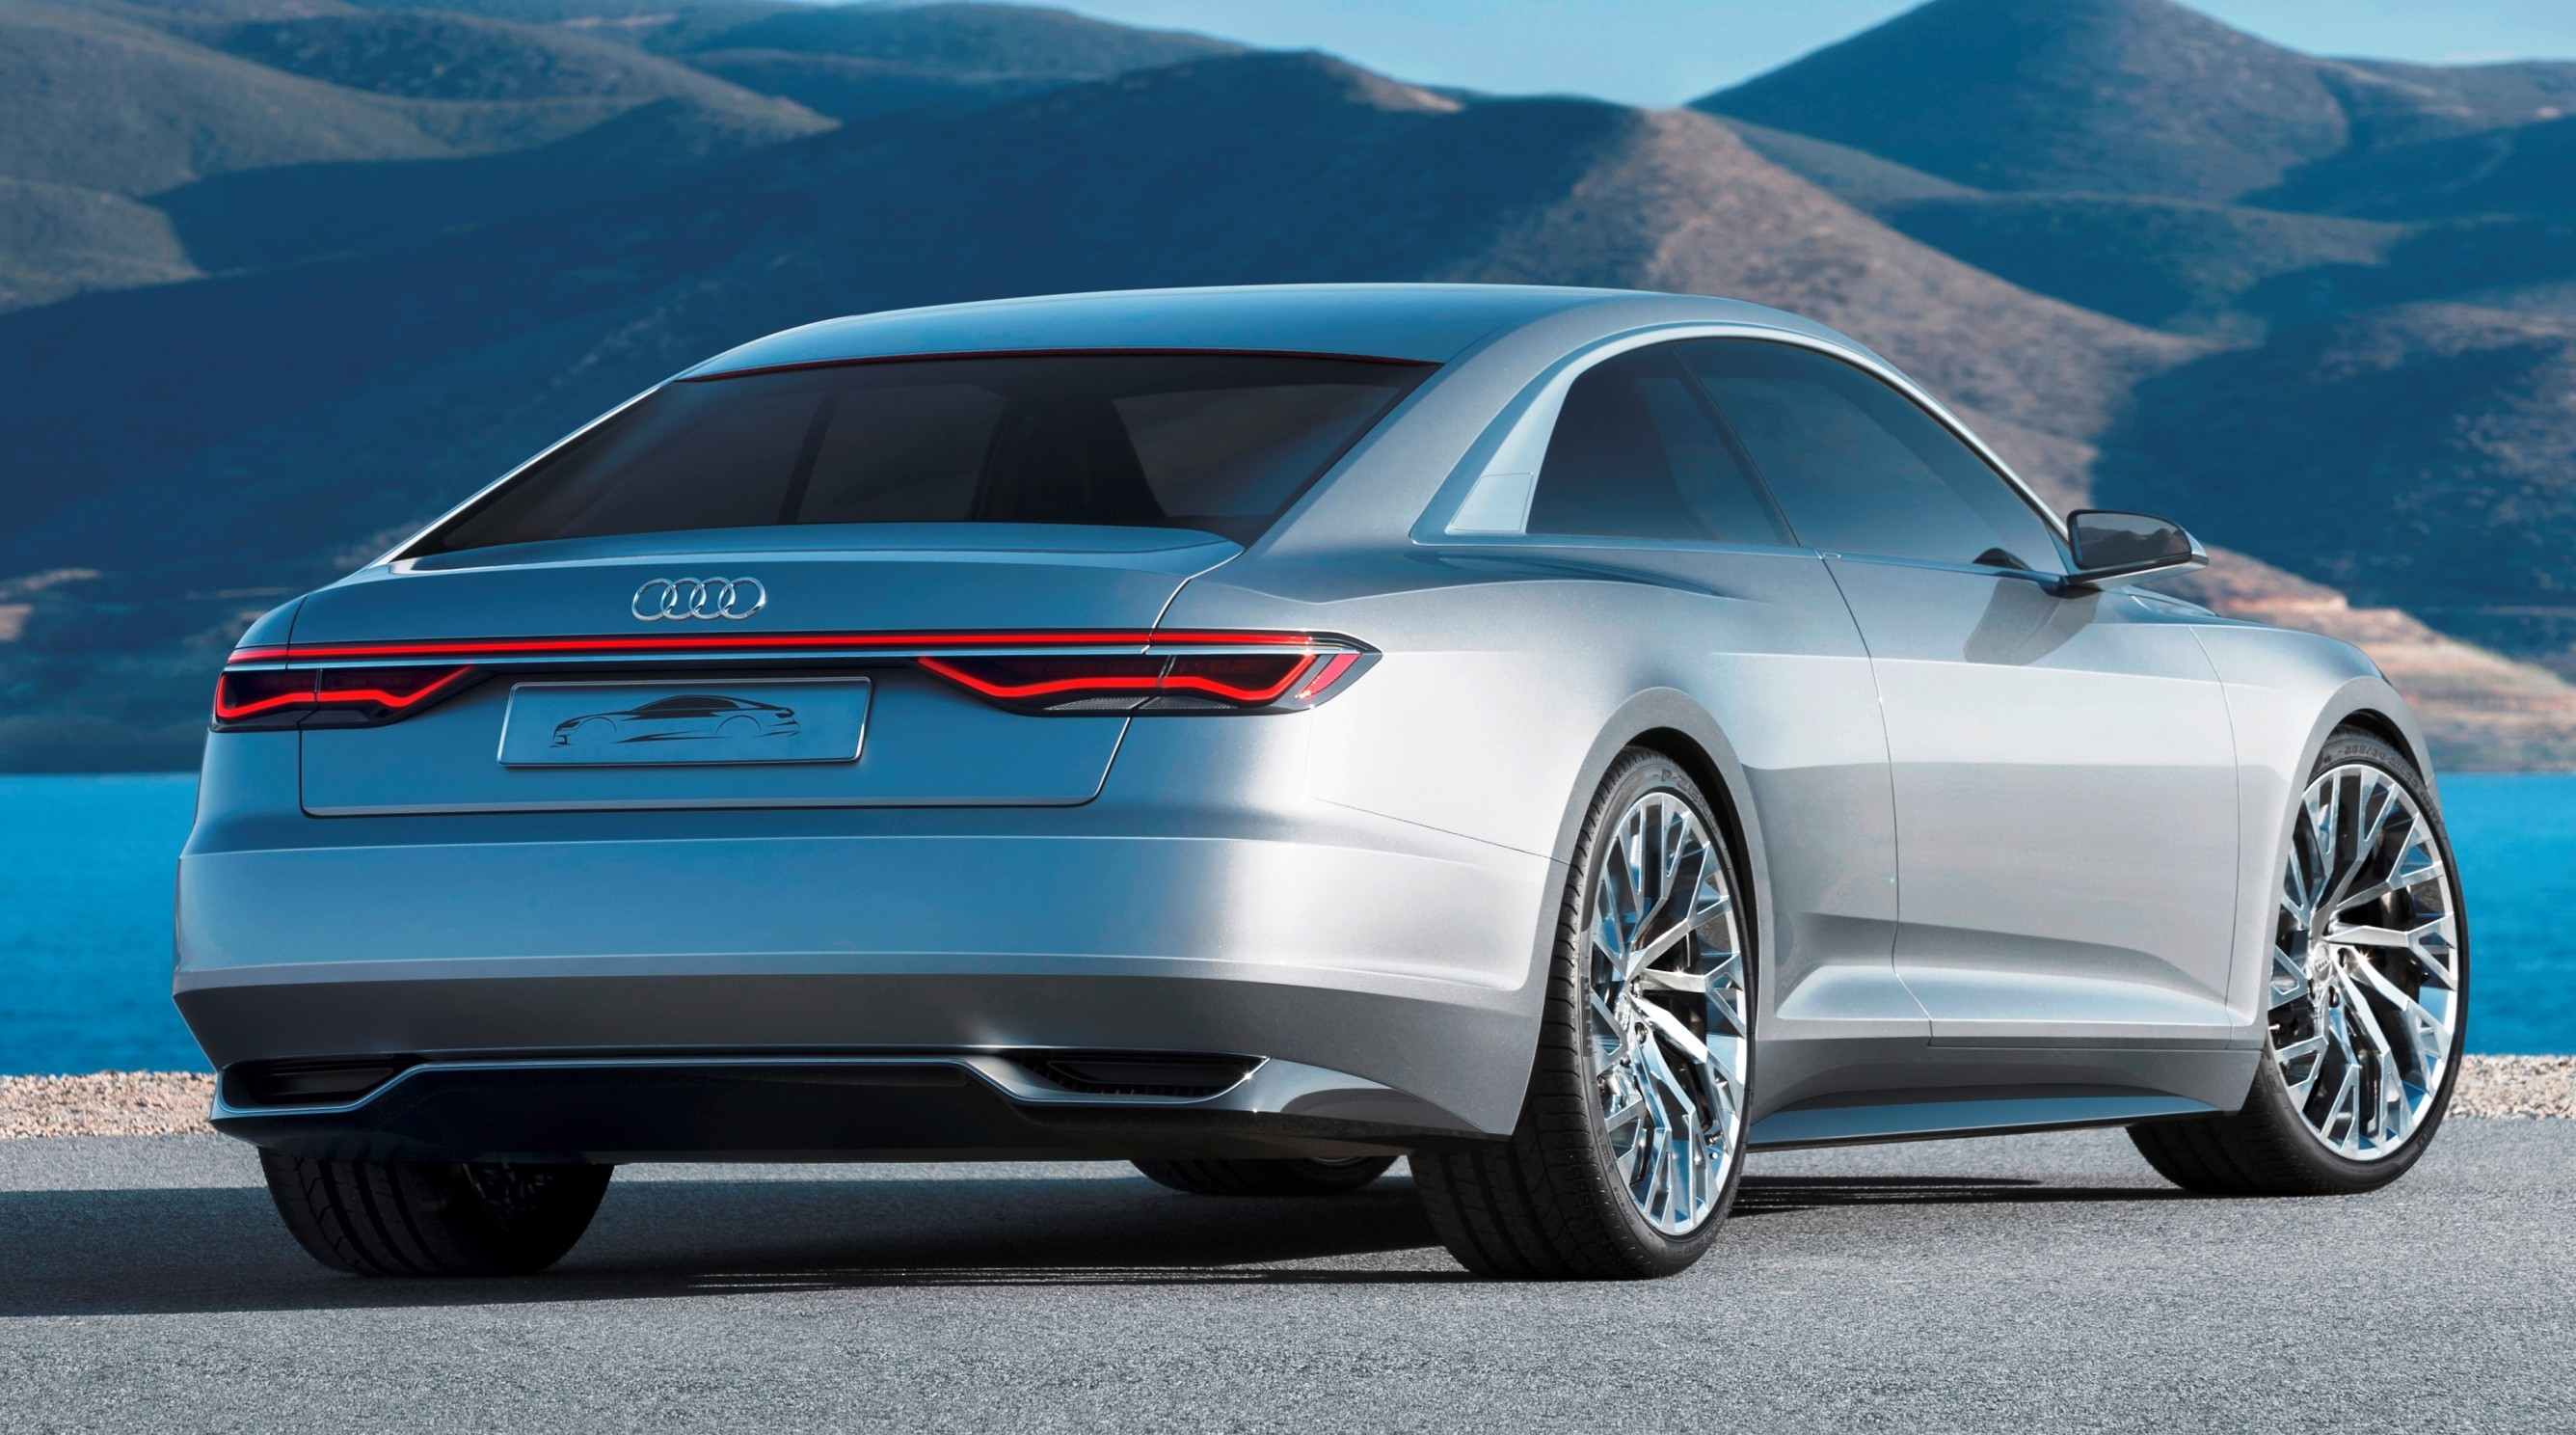 2014 Audi Prologue is Worst of LA 2014 21